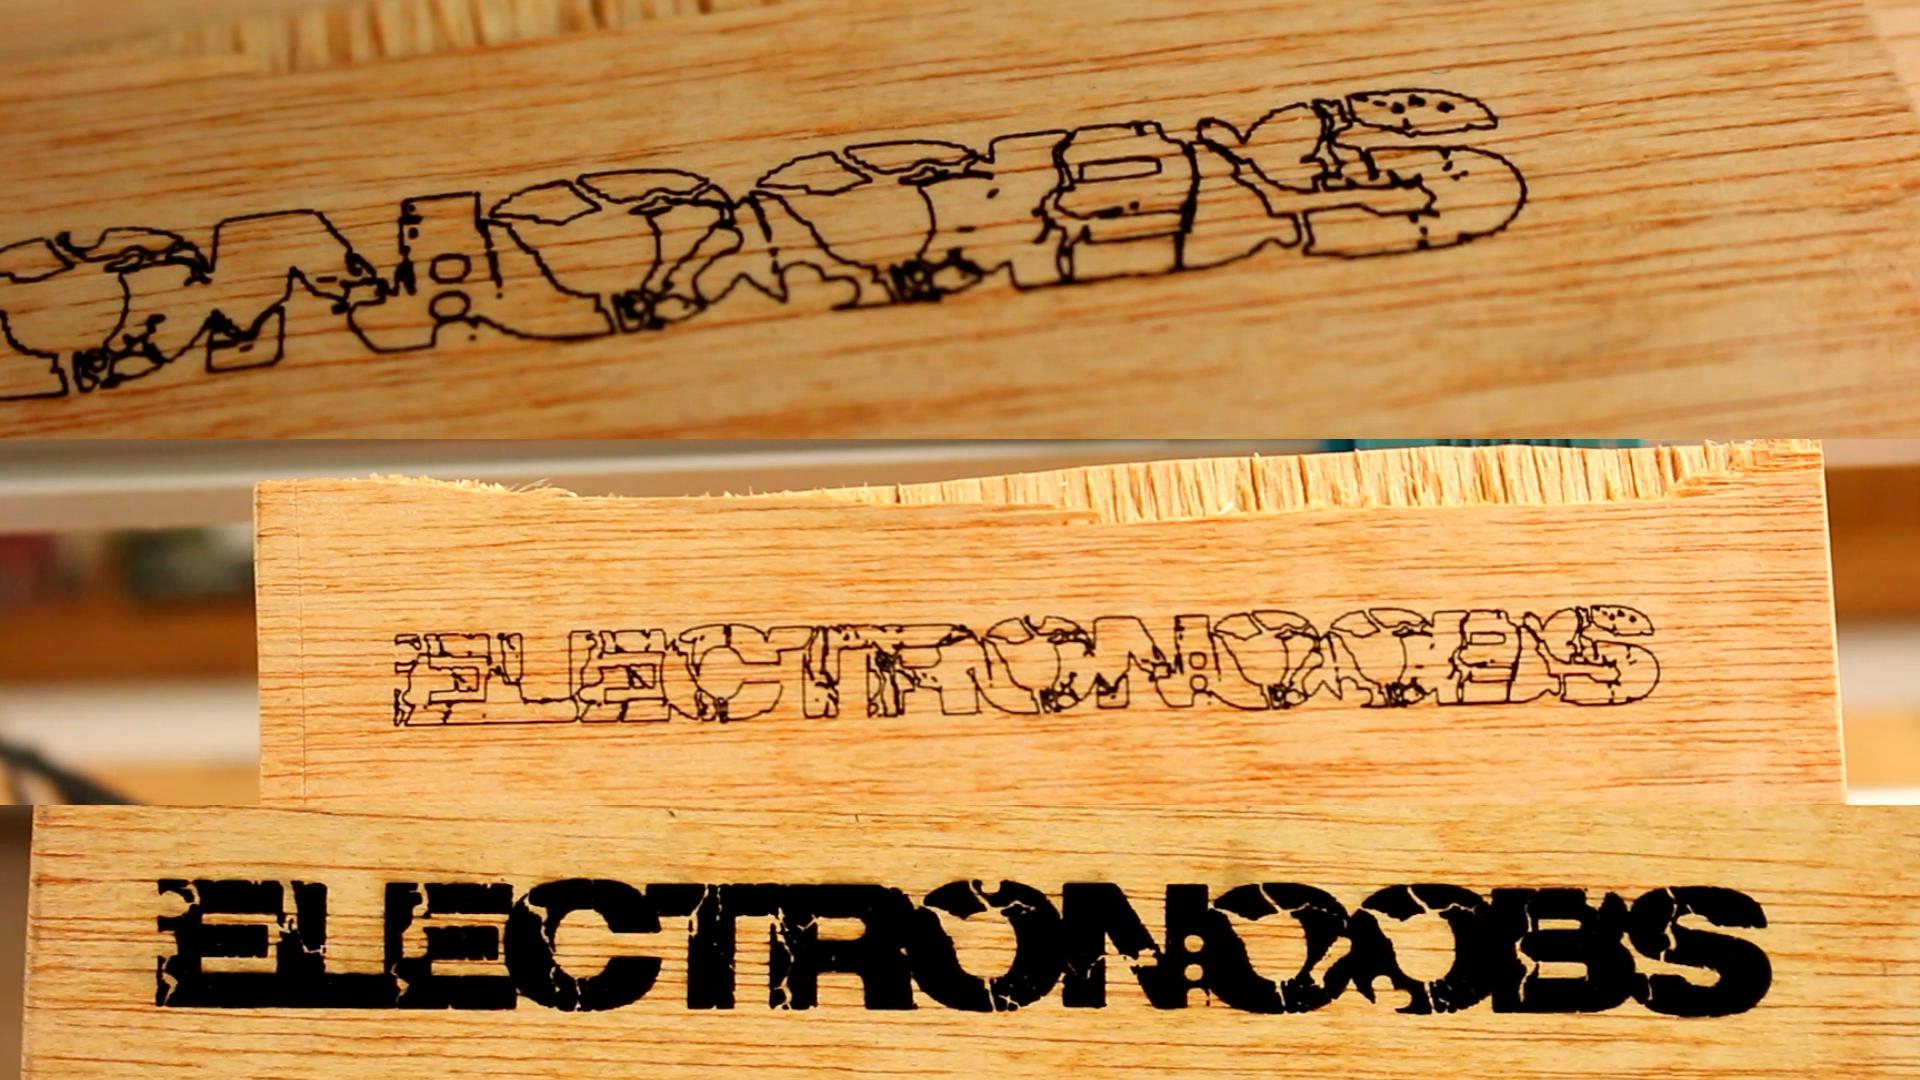 BenBox software install eleksa maker laser engraver